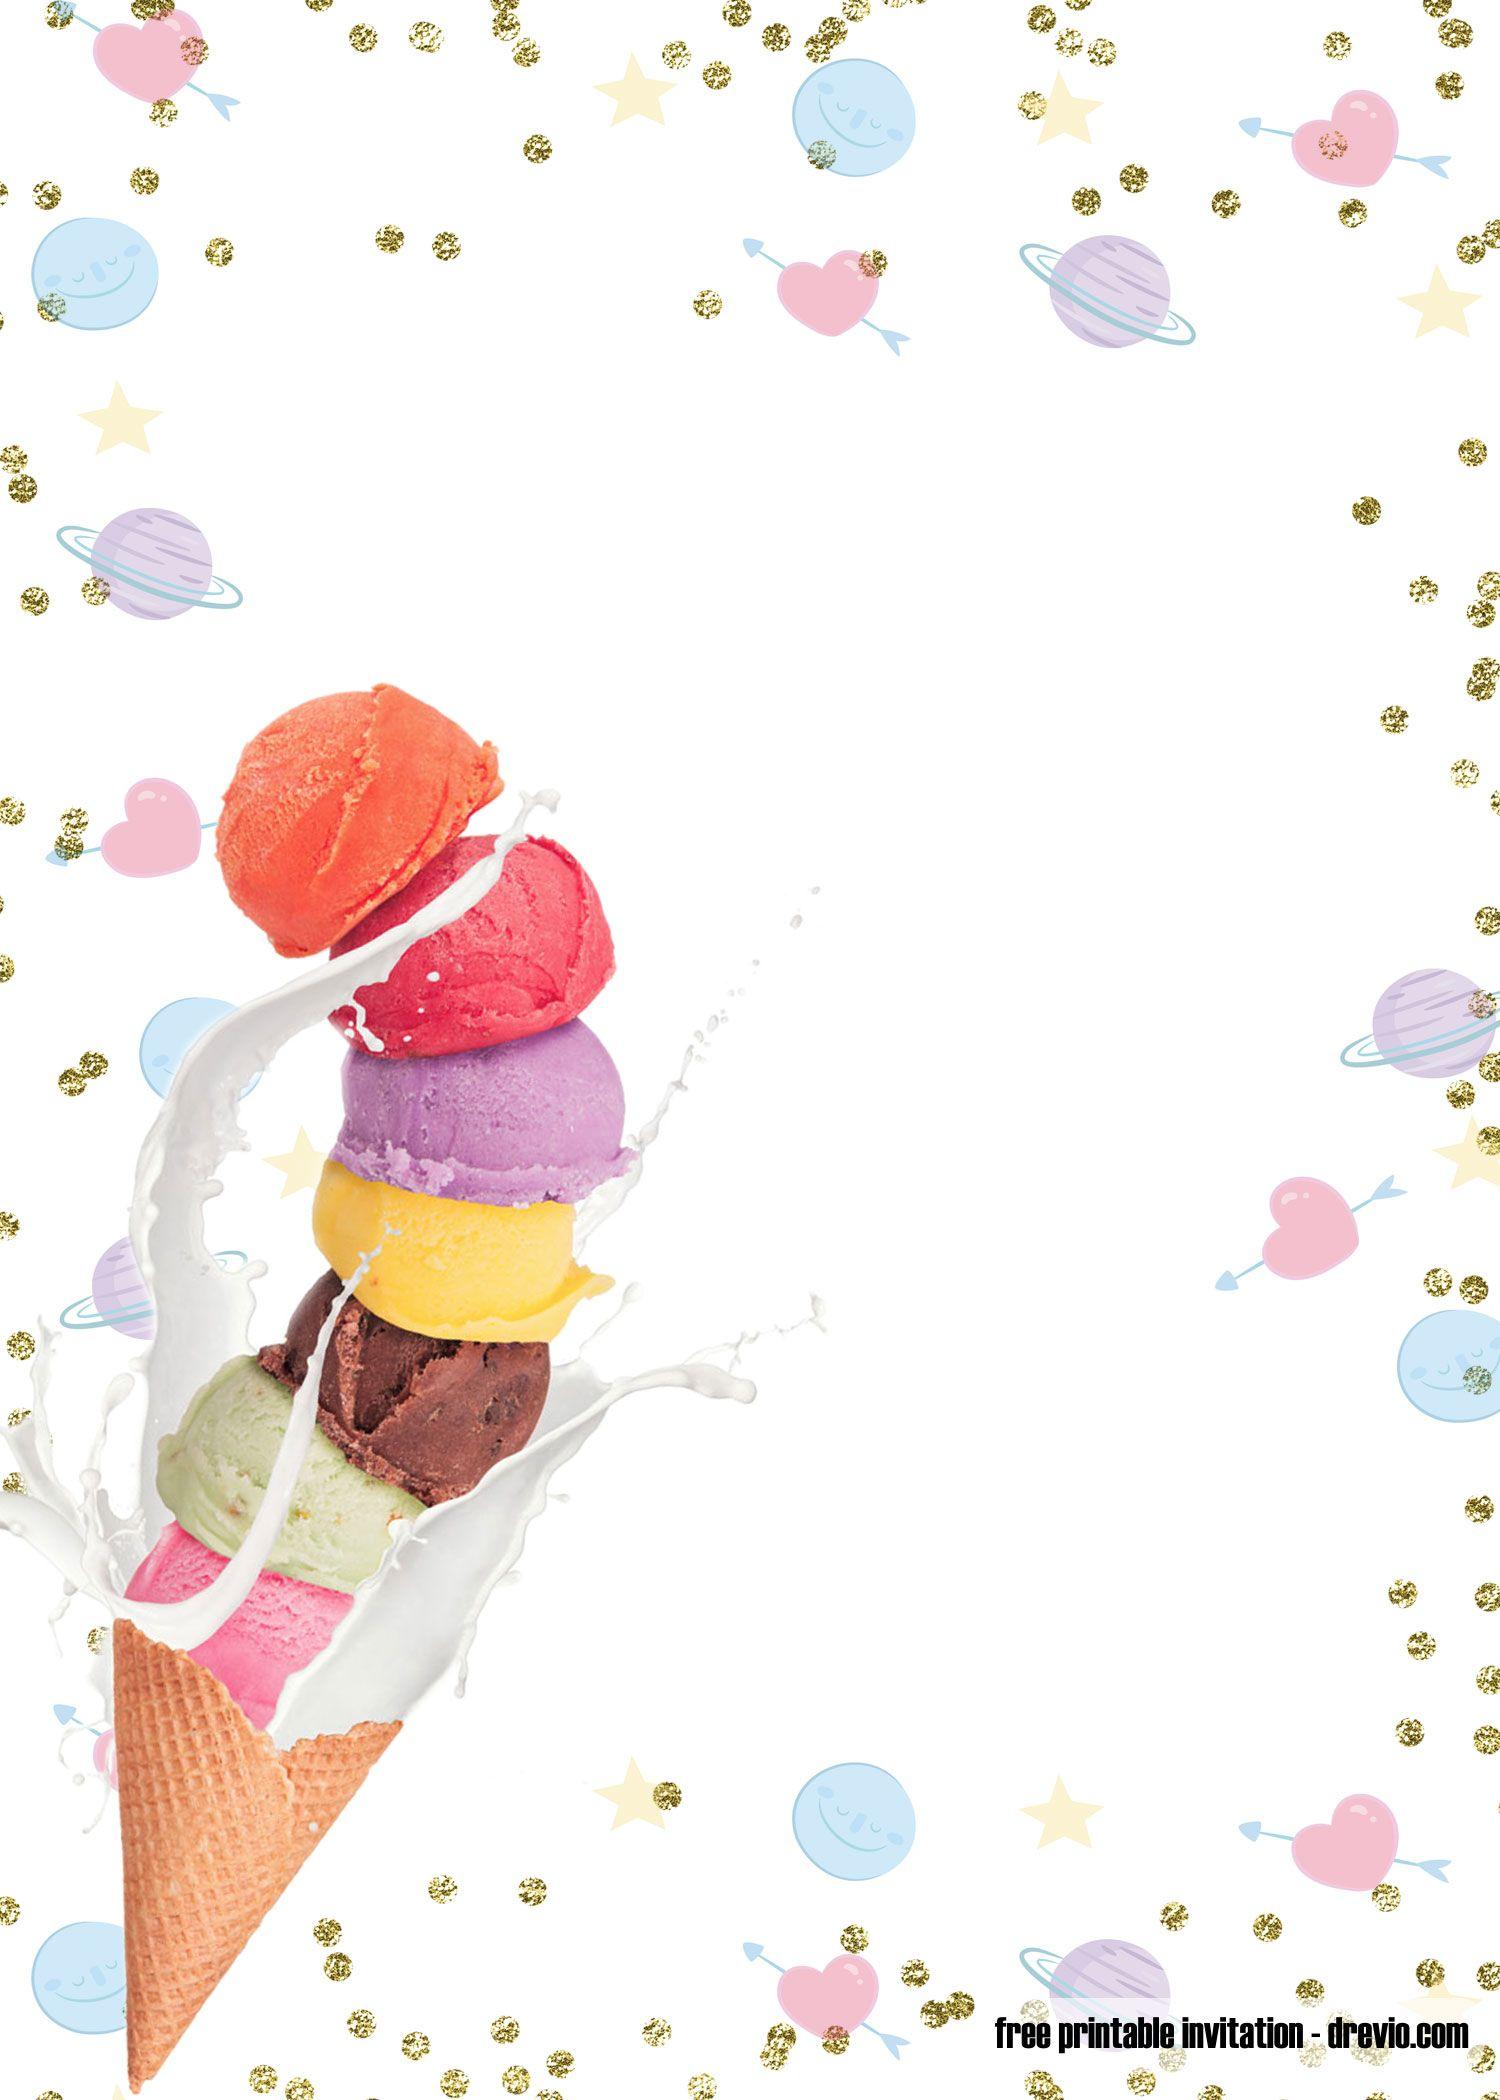 FREE Printable Ice Cream Birthday Invitation Templates  Ice cream